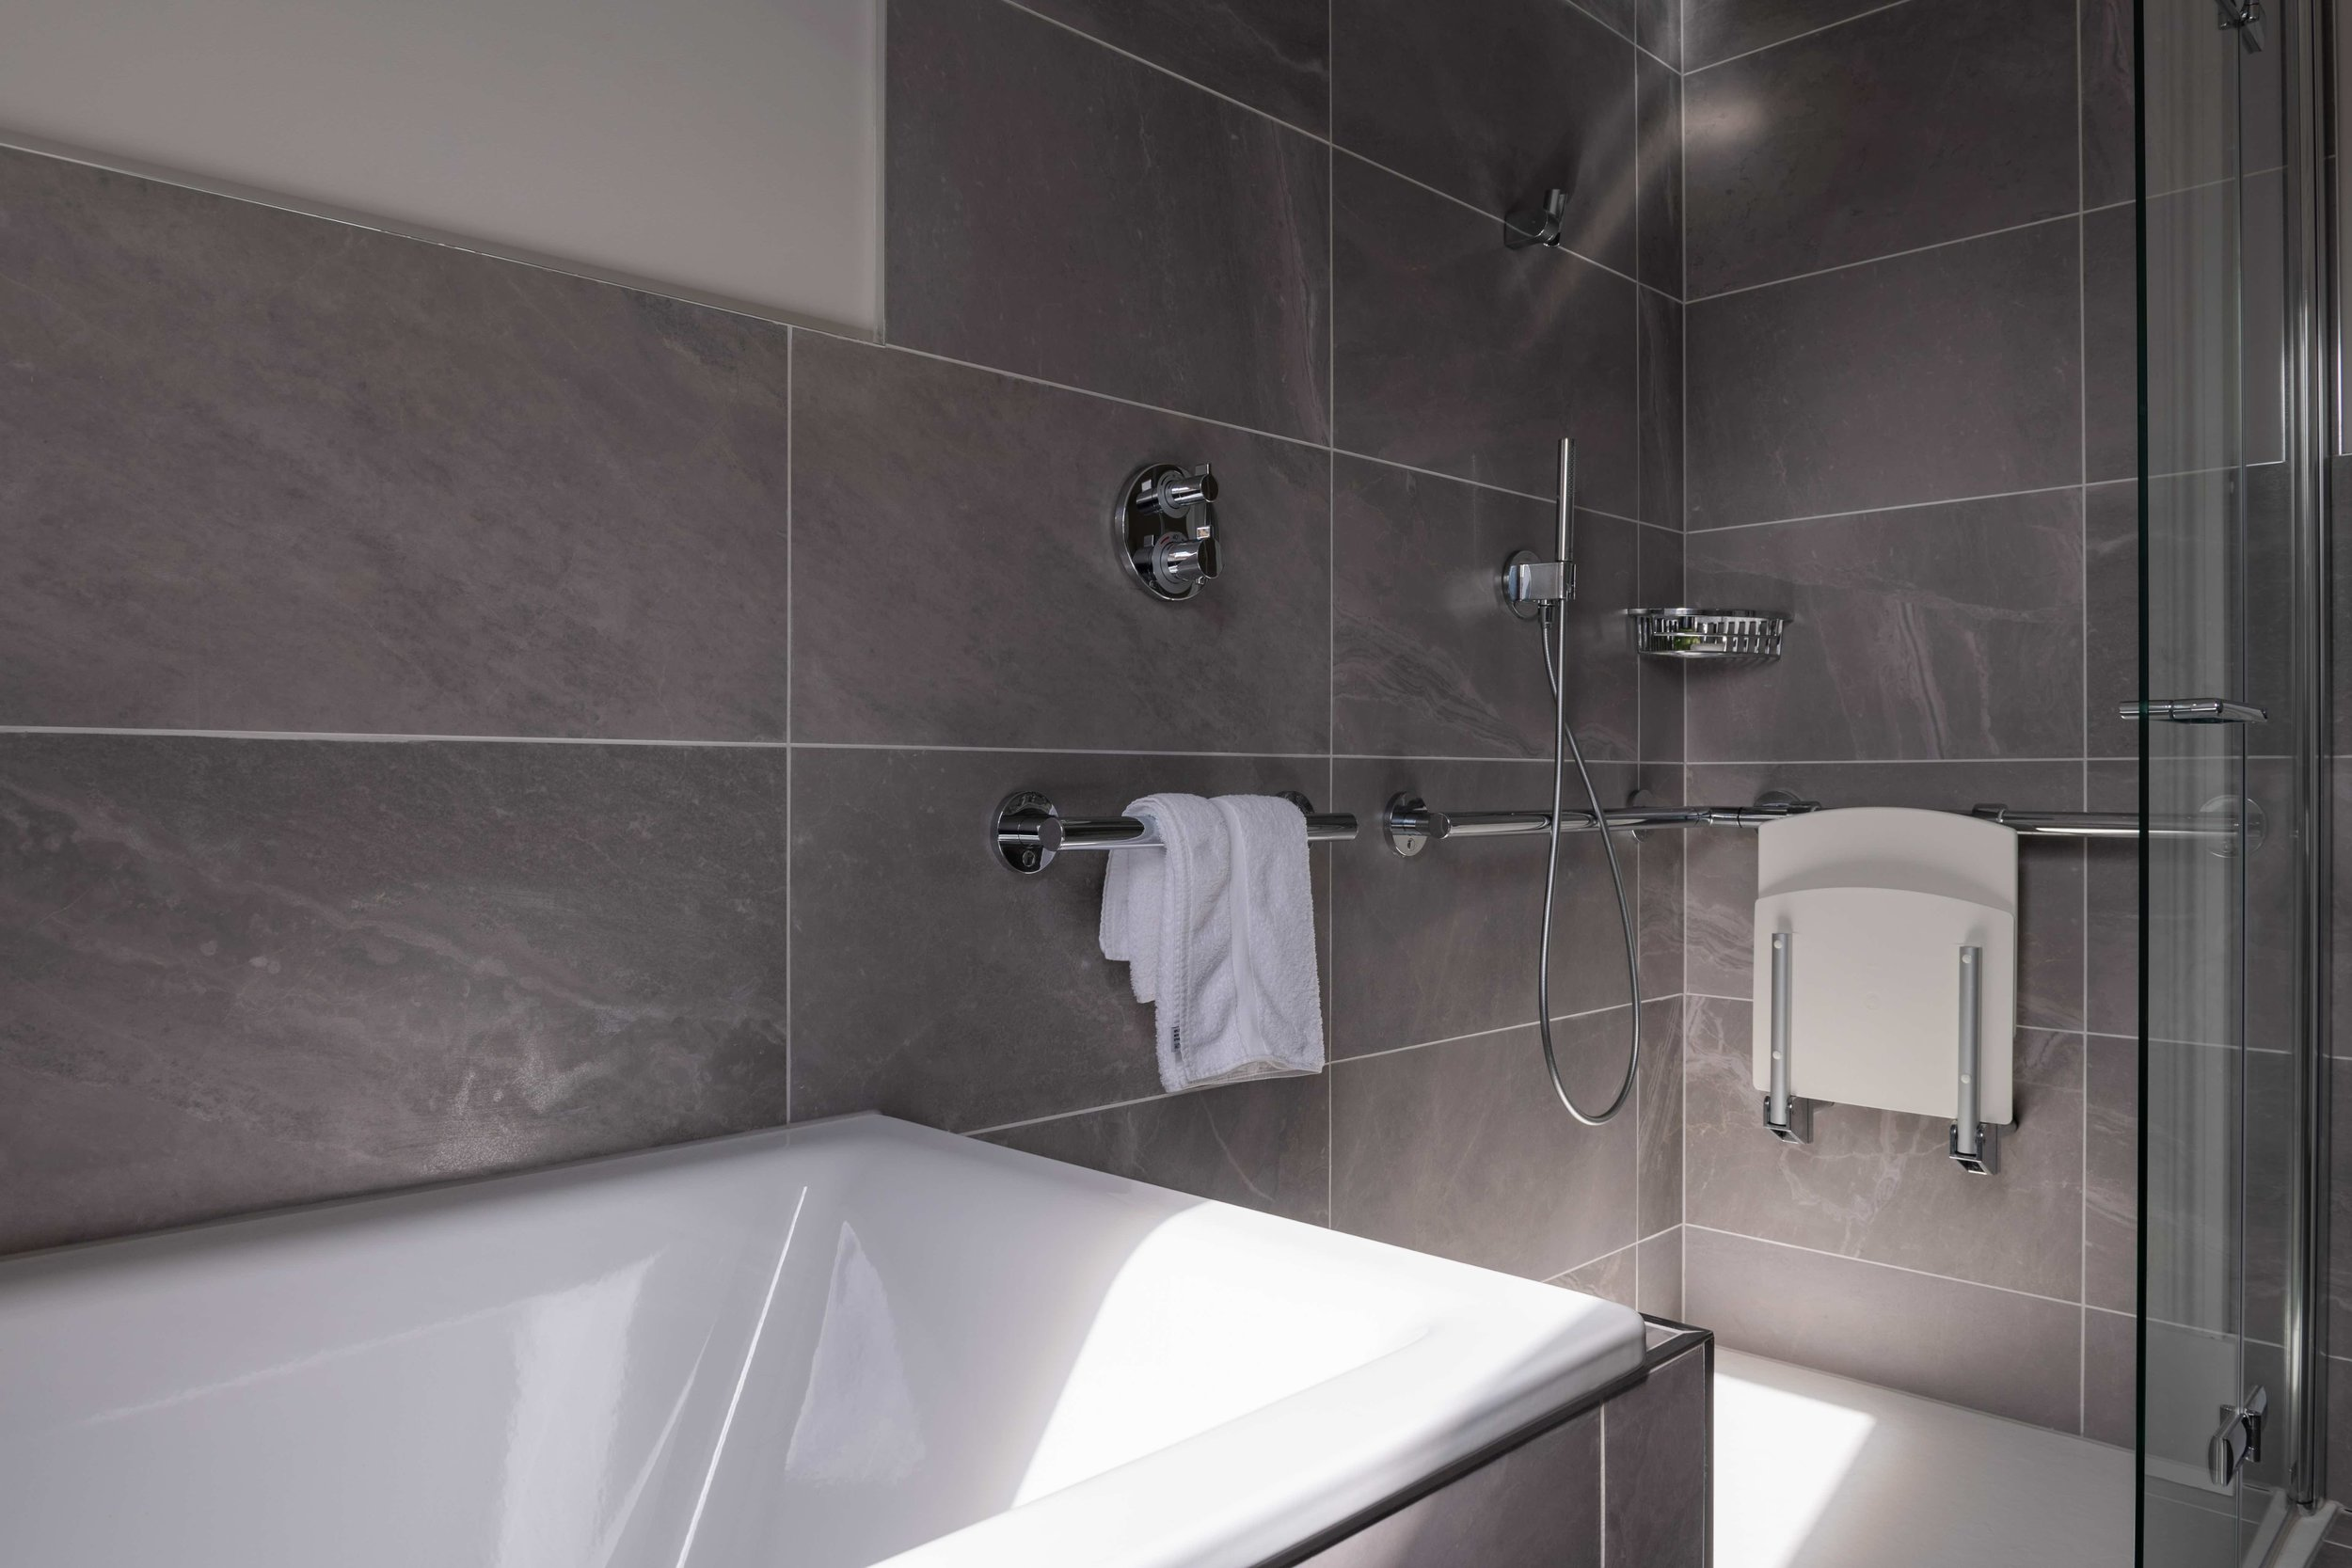 Room 9 Accessible bathroom